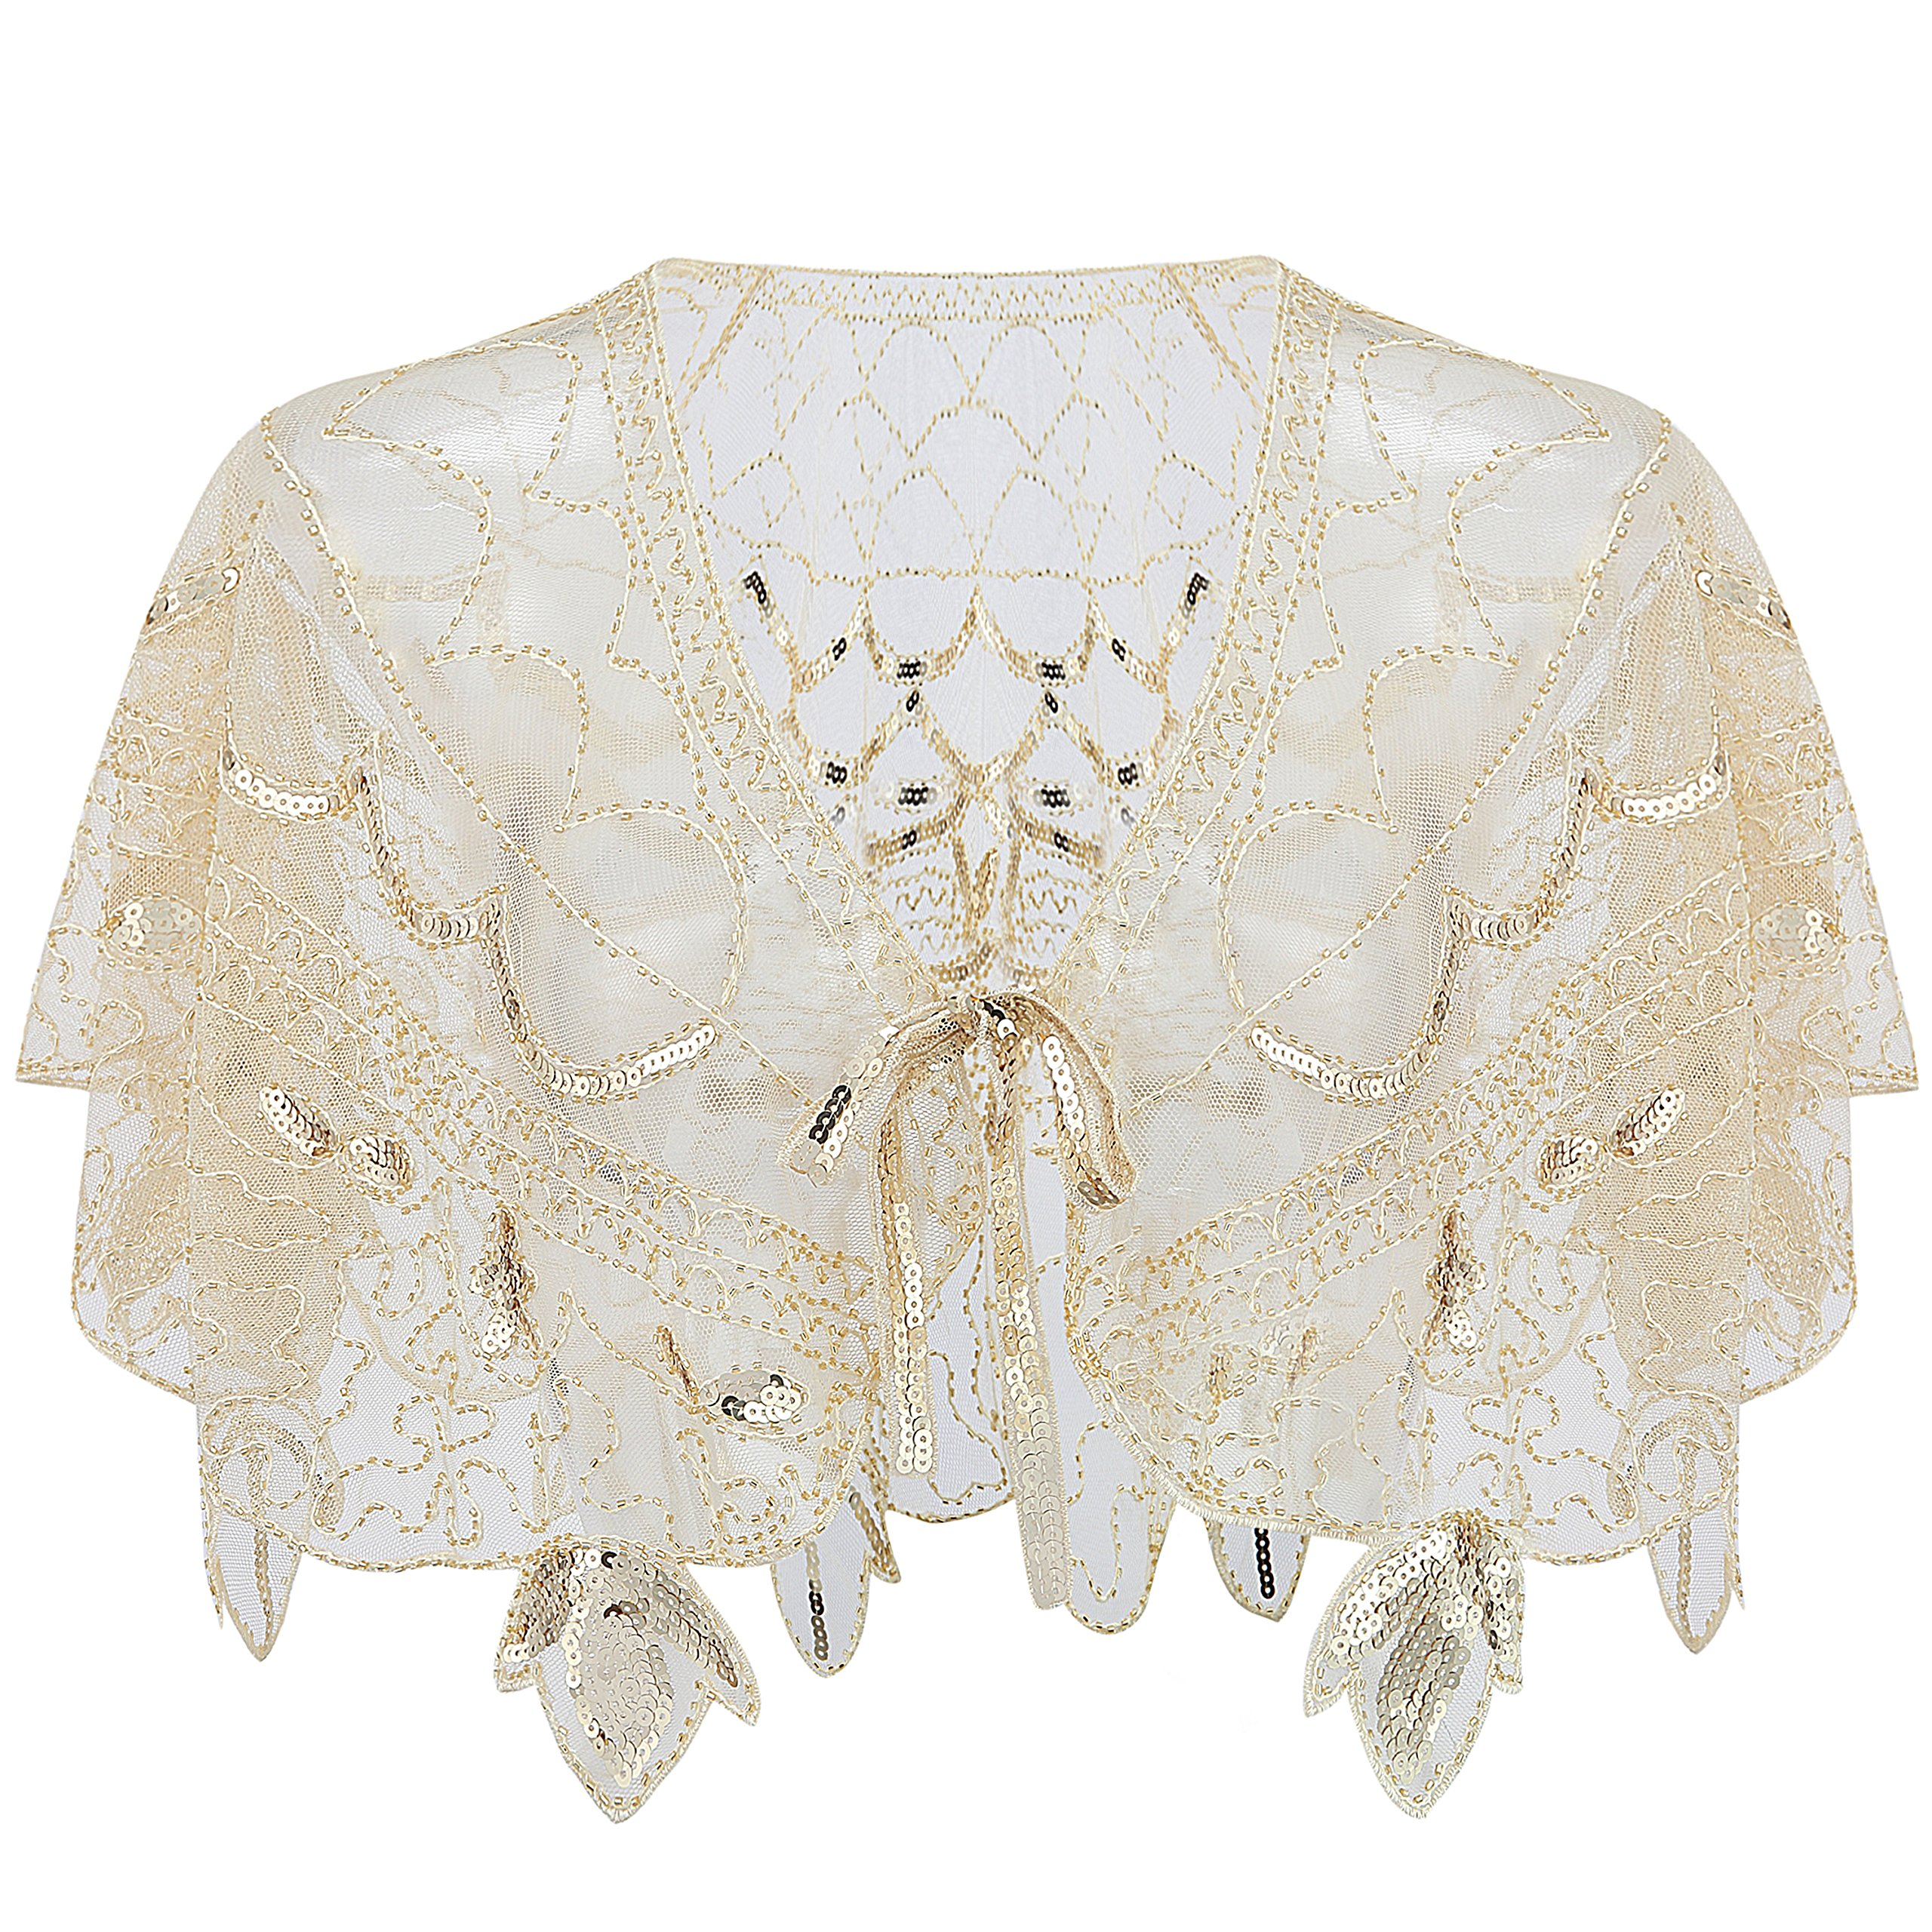 BABEYOND 1920s Shawl Wraps Beaded Evening Cape Bolero Bridal Shawl for Evening Dresses Wedding Party (Z-Beige) by BABEYOND